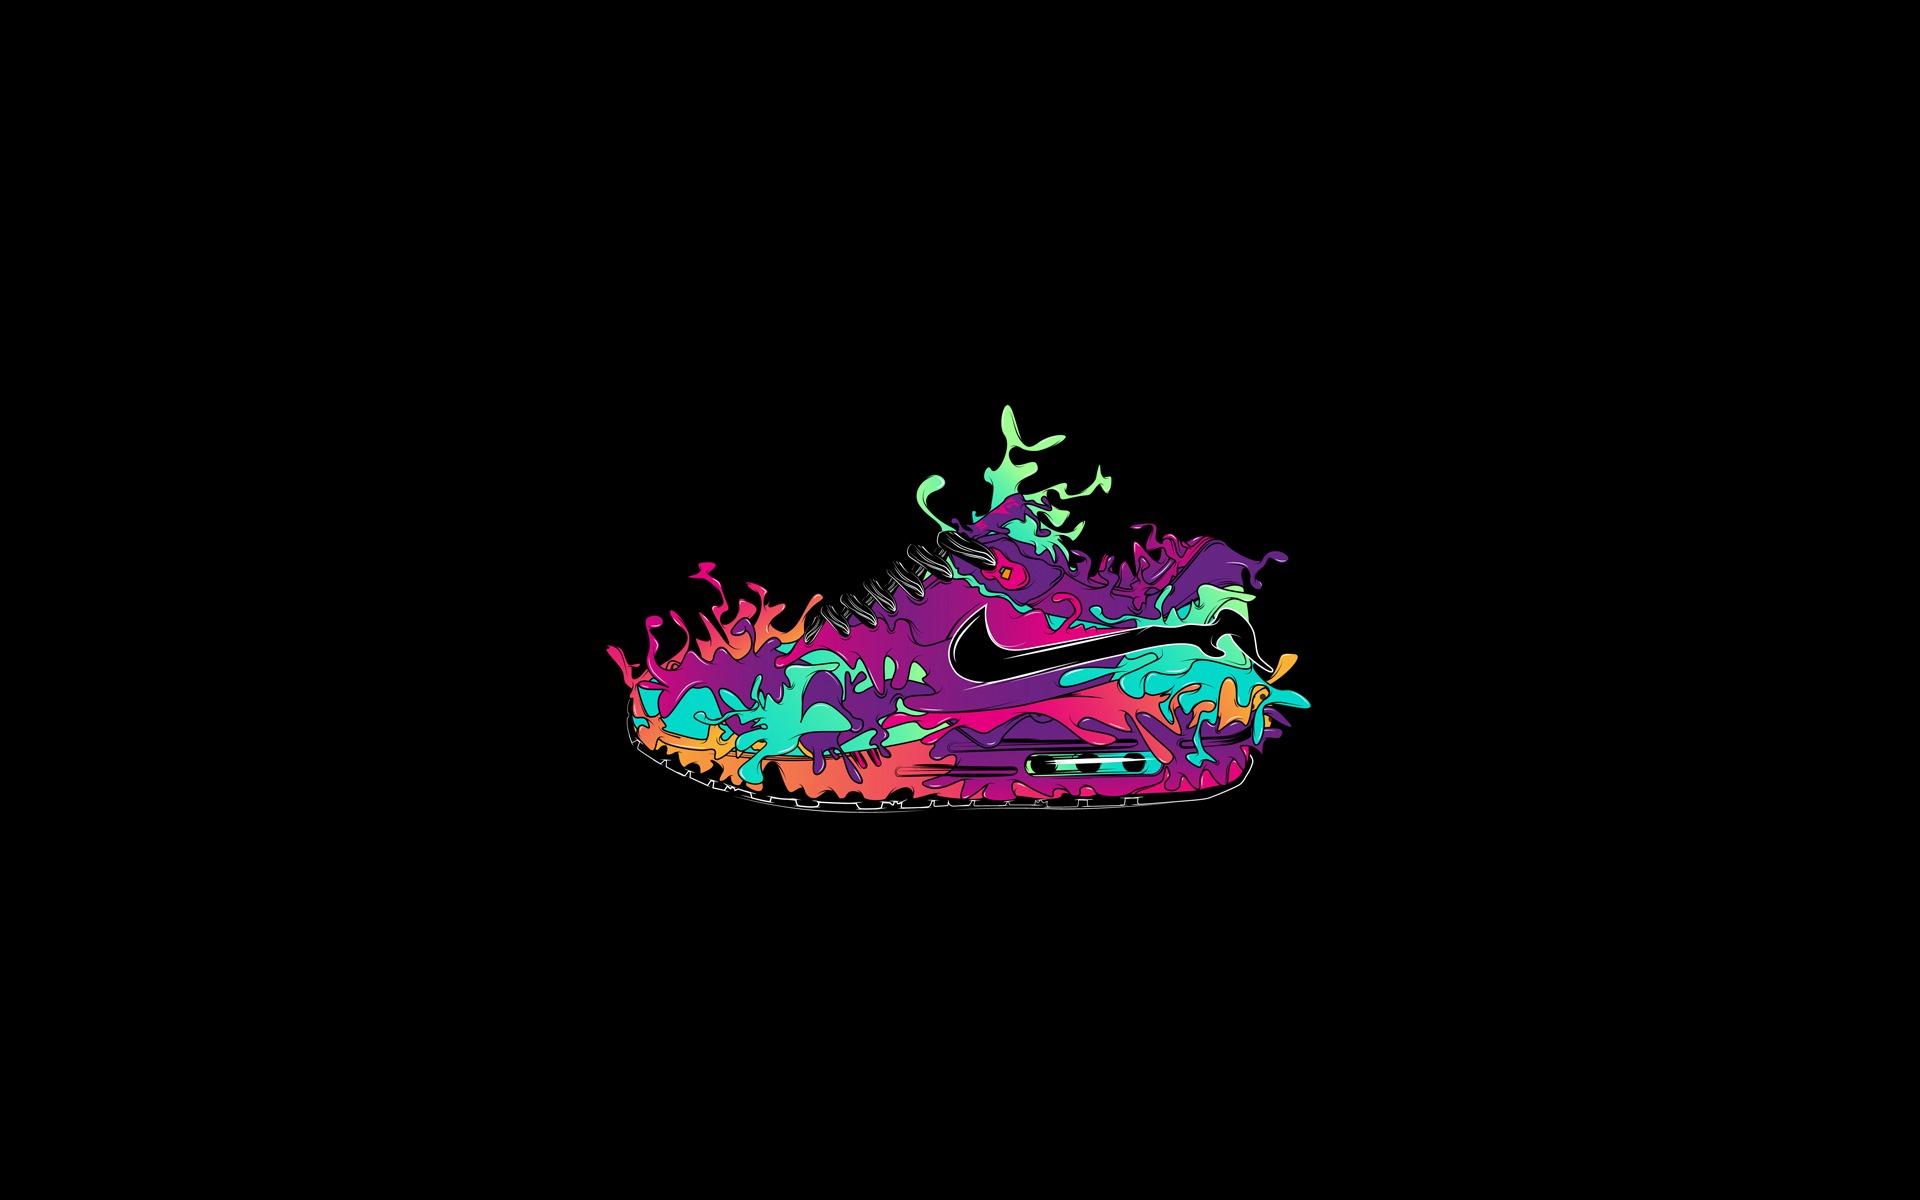 Cool Nike HD Wallpapers 1920x1200